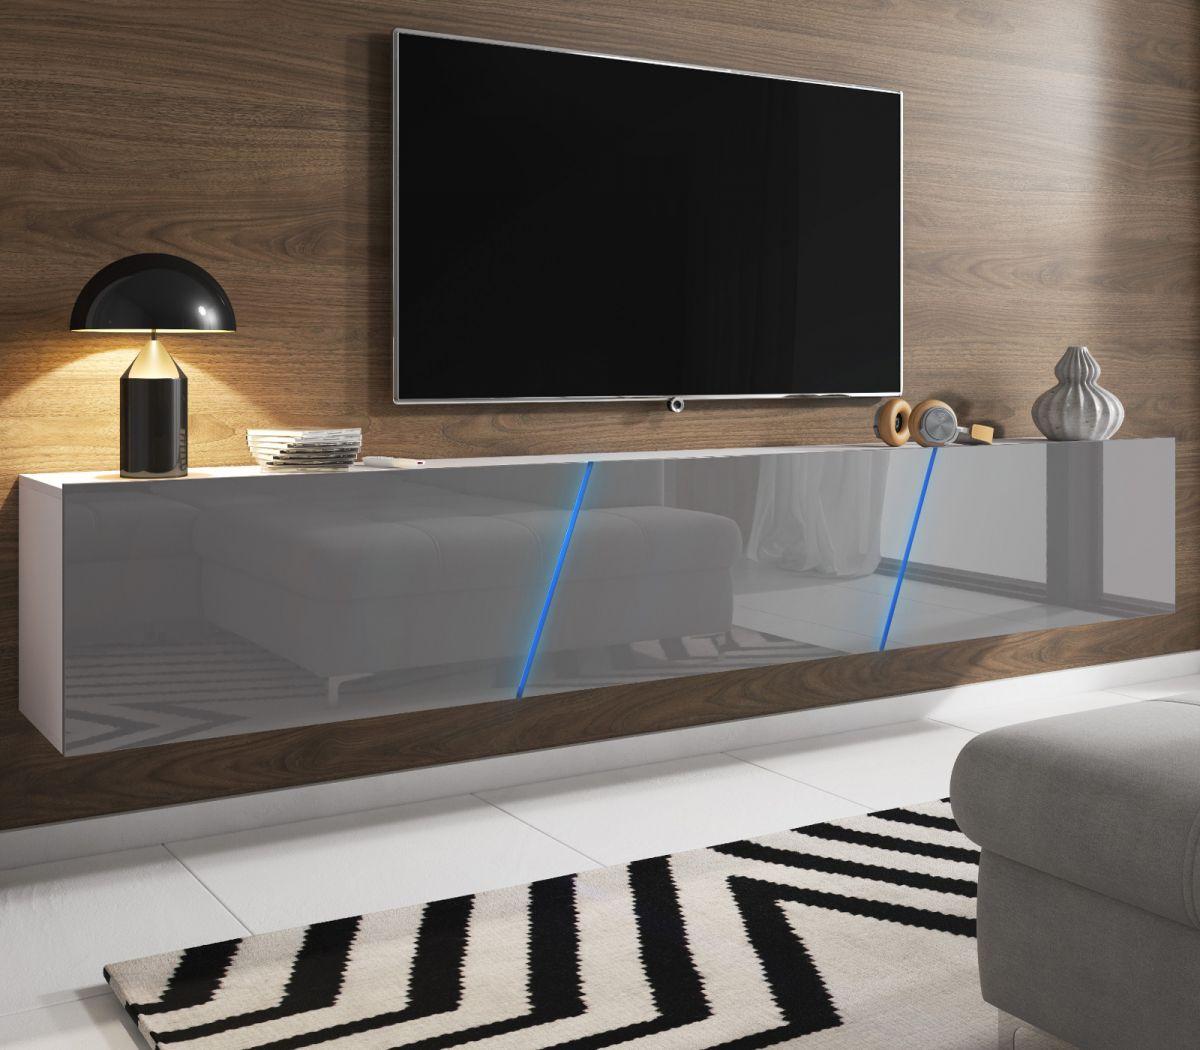 TV-Lowboard Space Hochglanz grau XXL-Board 240 cm hängend - stehend mit LED